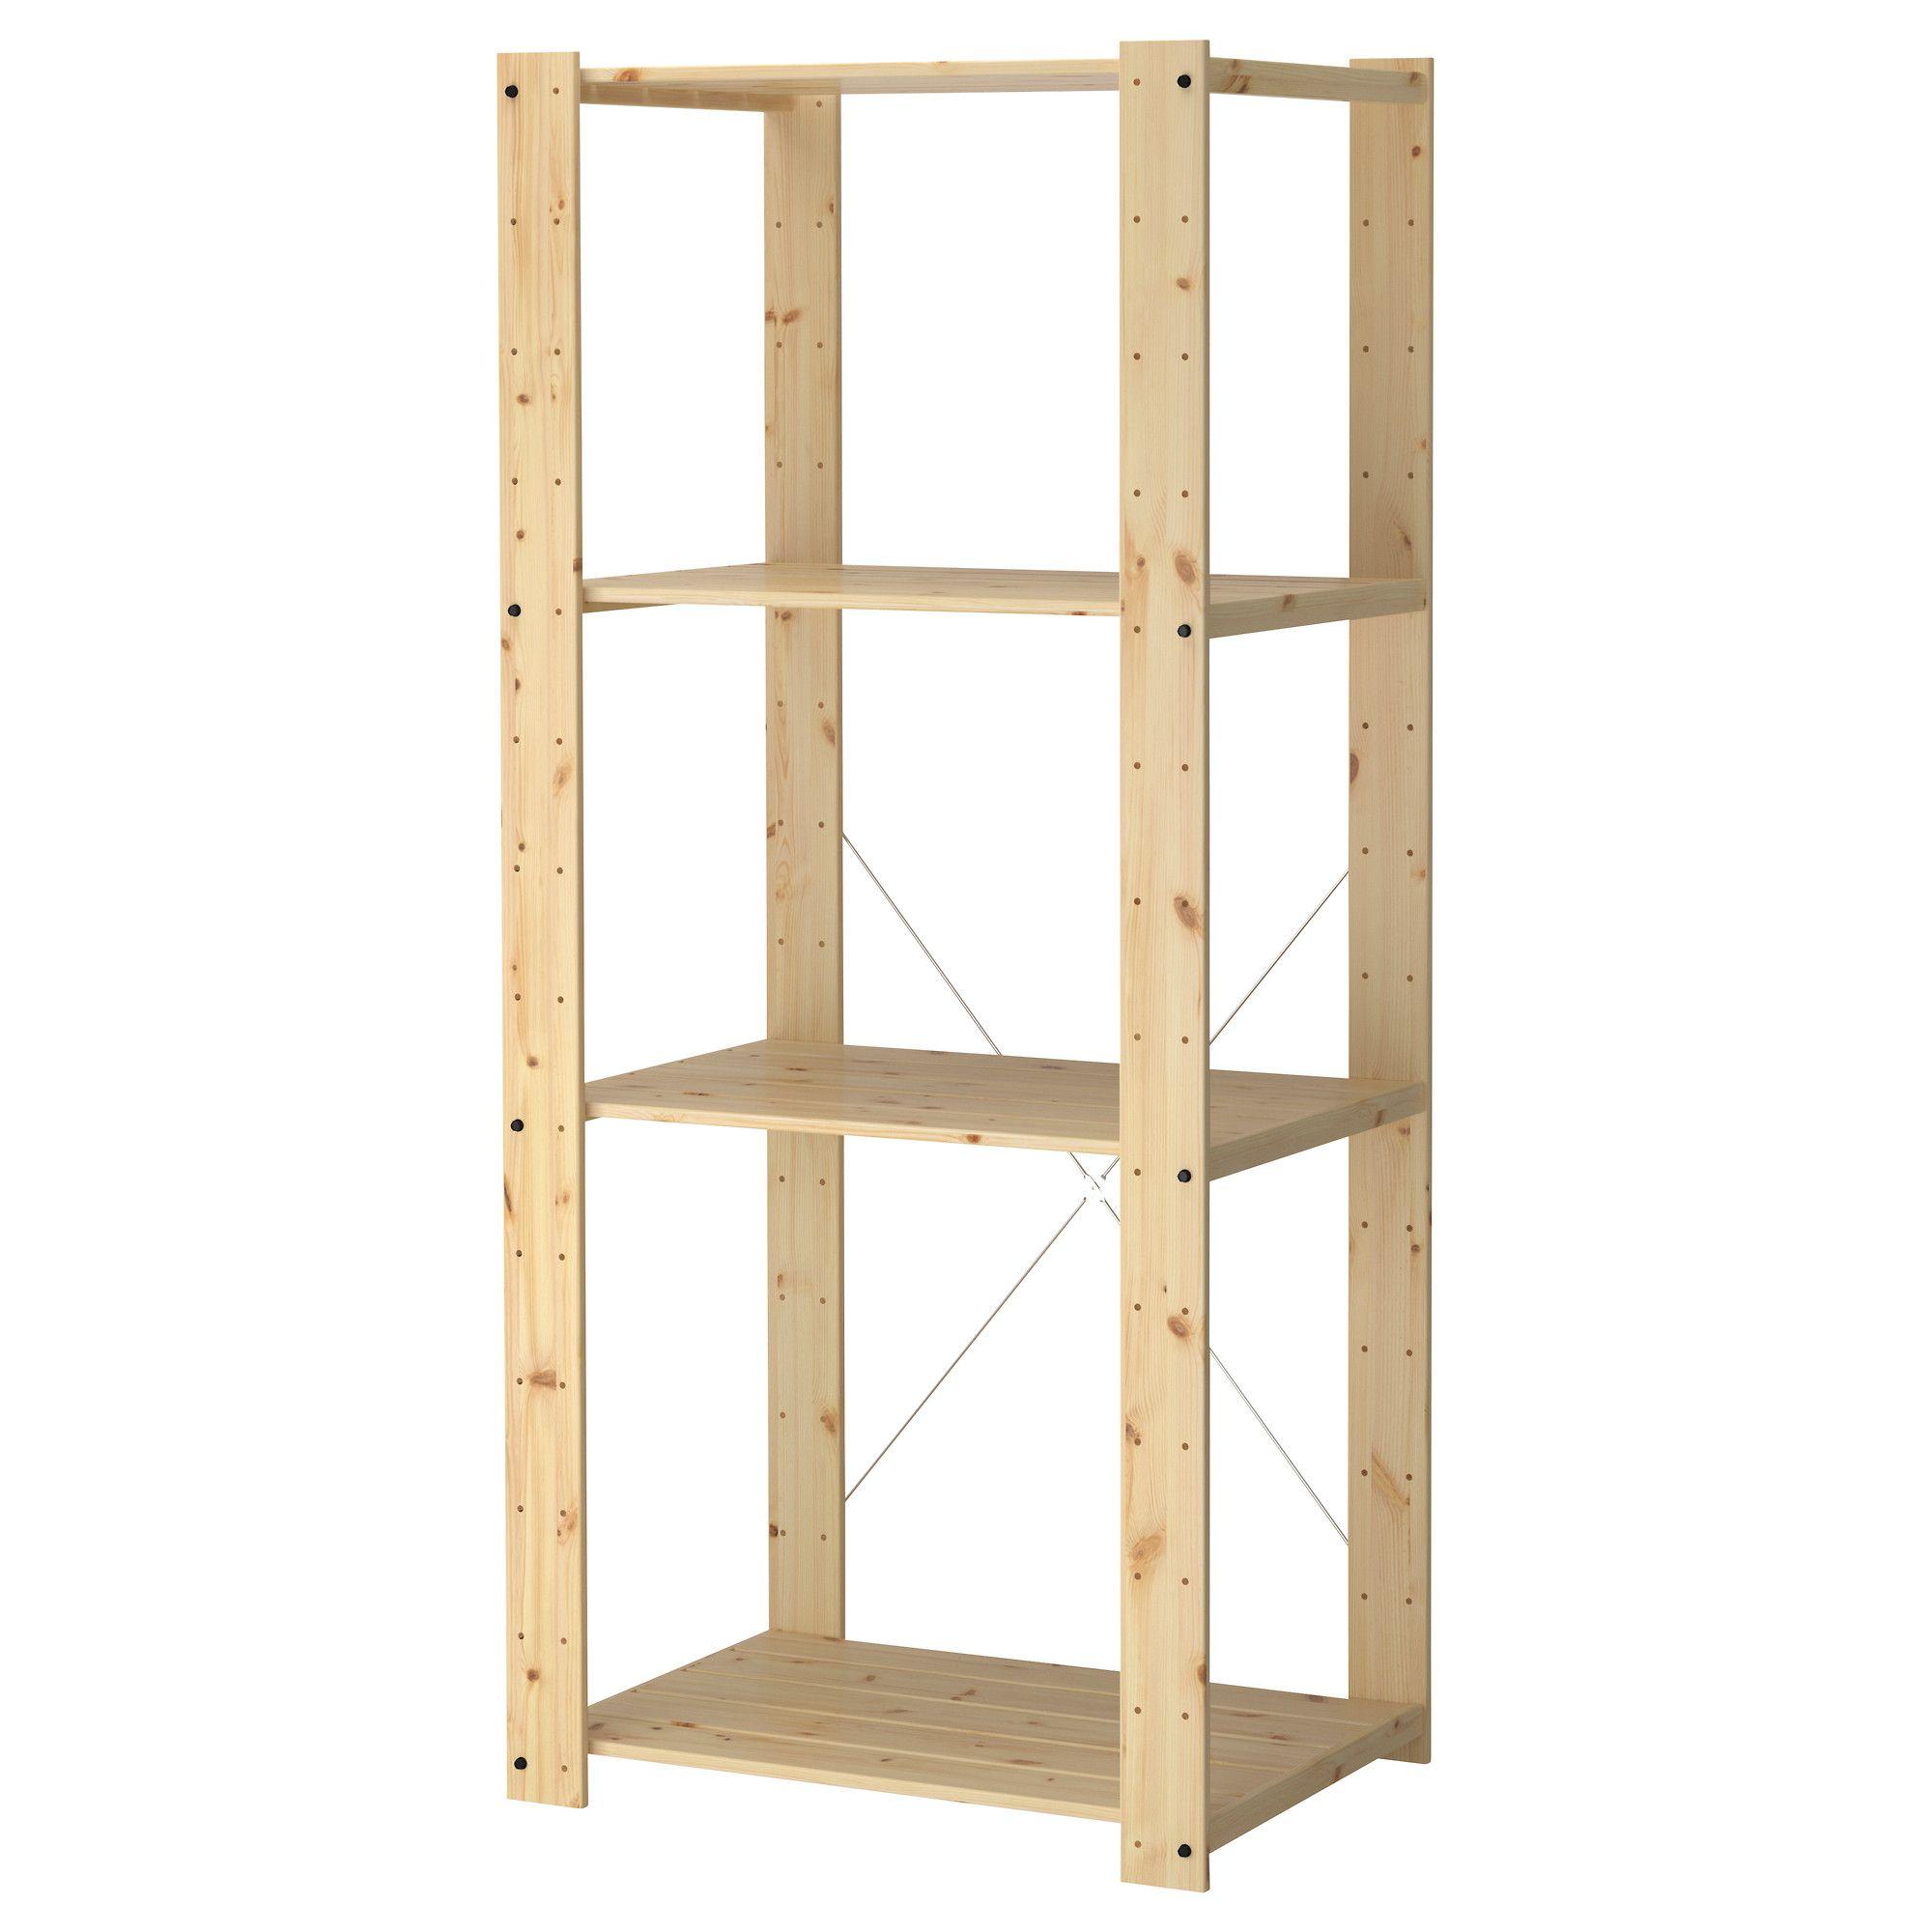 "Pantry Storage Shelving Units Small Metal Shelving Unit: GORM Shelving Unit - 30 3/4x21 5/8x68 1/2 "" - IKEA"